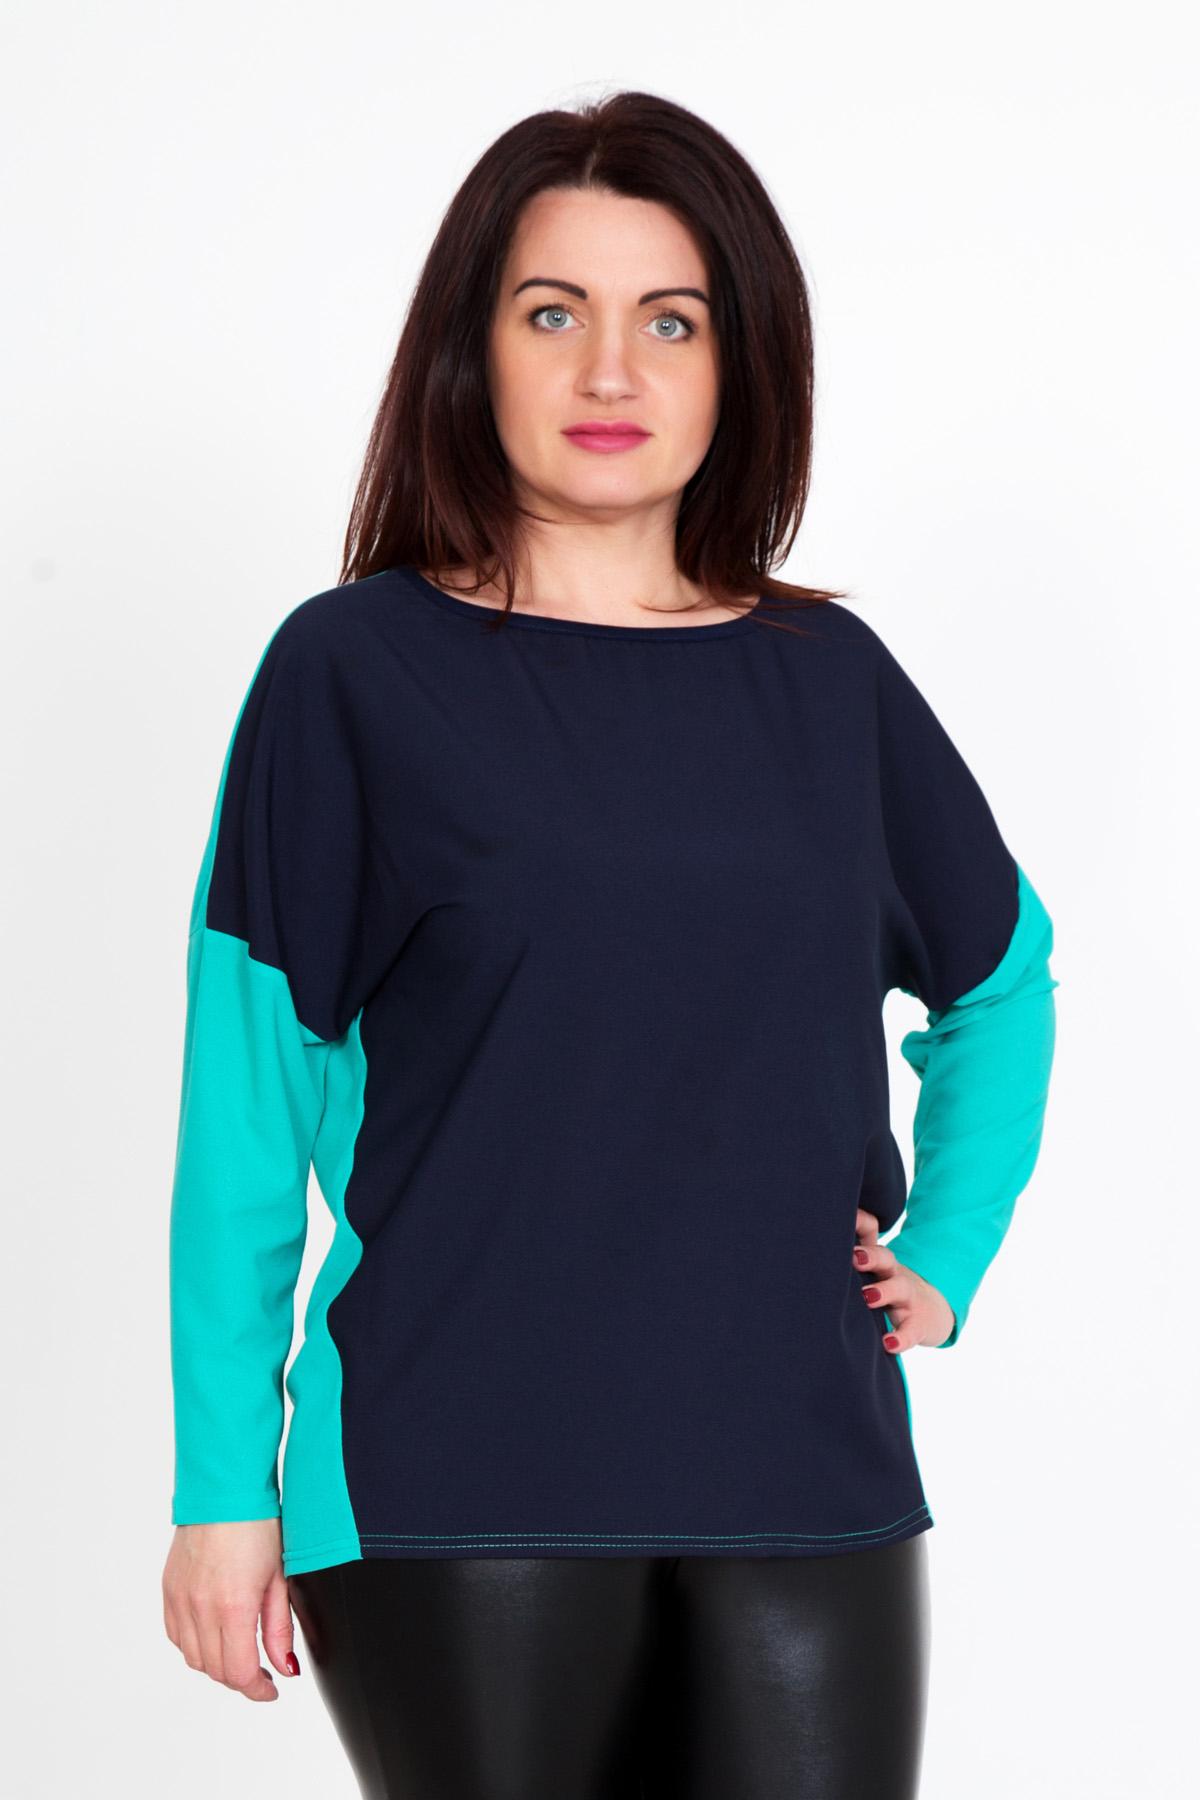 Жен. блуза Наоми р. 48Блузы<br>Обхват груди:96 см<br>Обхват талии:78 см<br>Обхват бедер:104 см<br>Длина по спинке:65 см<br>Рост:167 см<br><br>Тип: Жен. блуза<br>Размер: 48<br>Материал: Креп